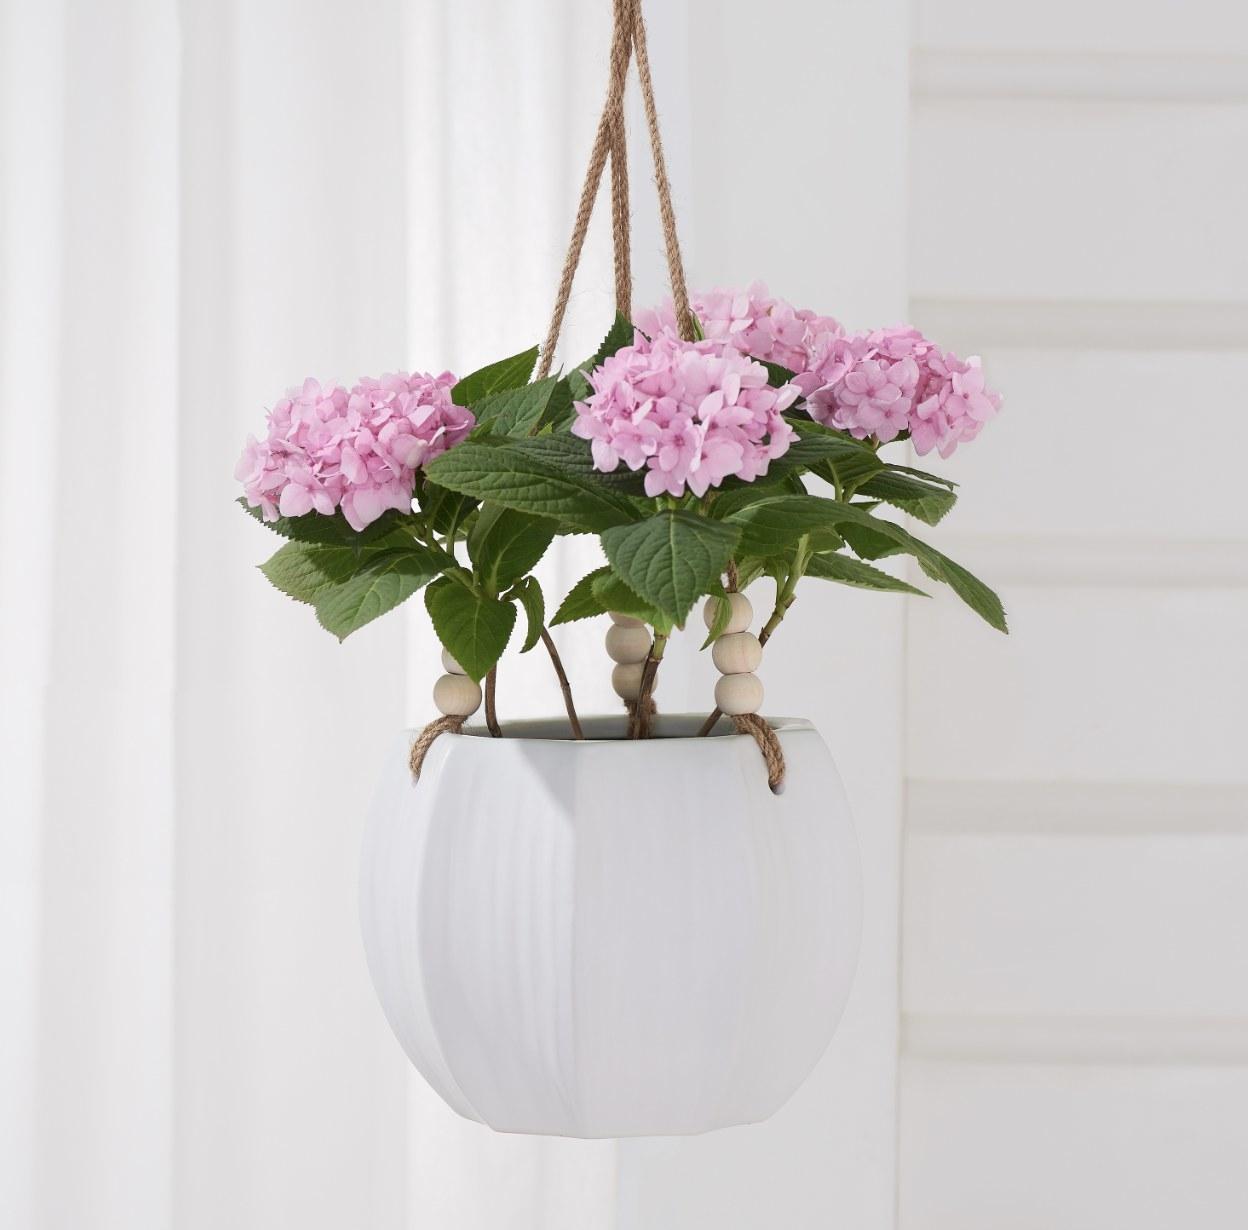 A hanging planter